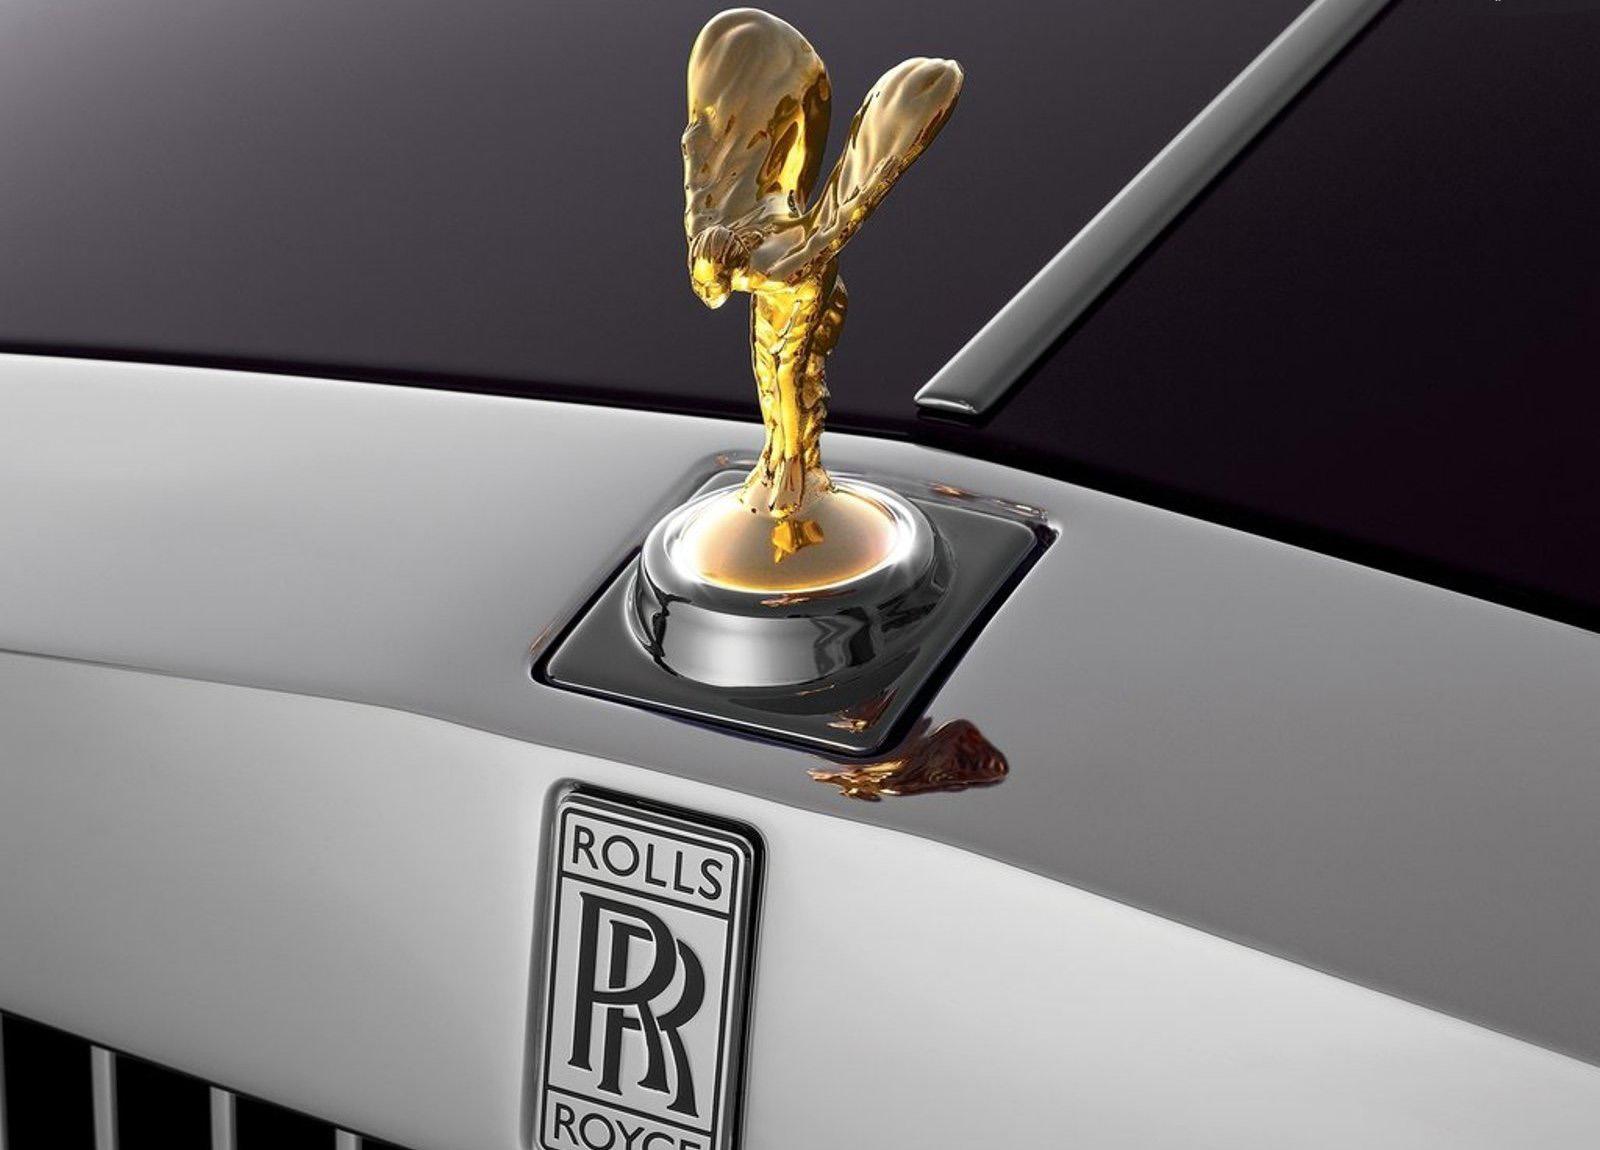 Rolls Royce Symbol Wallpaper